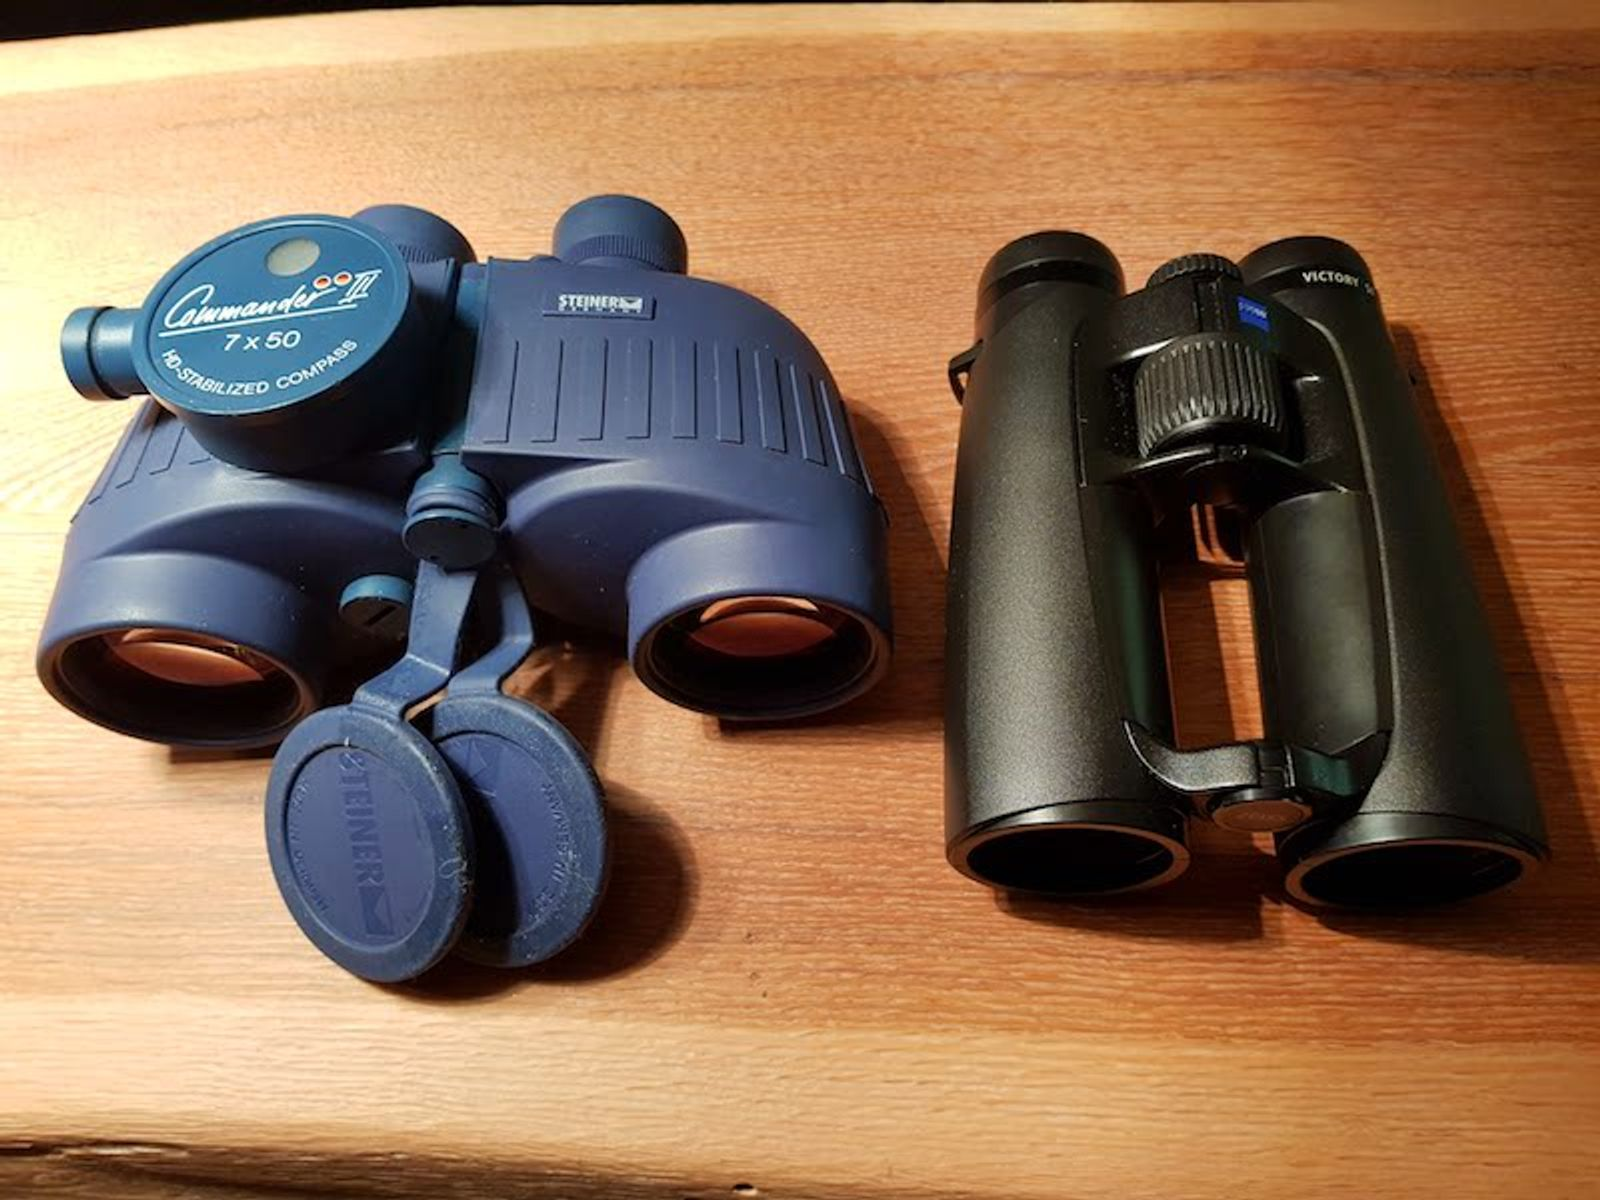 Zeiss Laser Entfernungsmesser : Fernglas zeiss victory sf